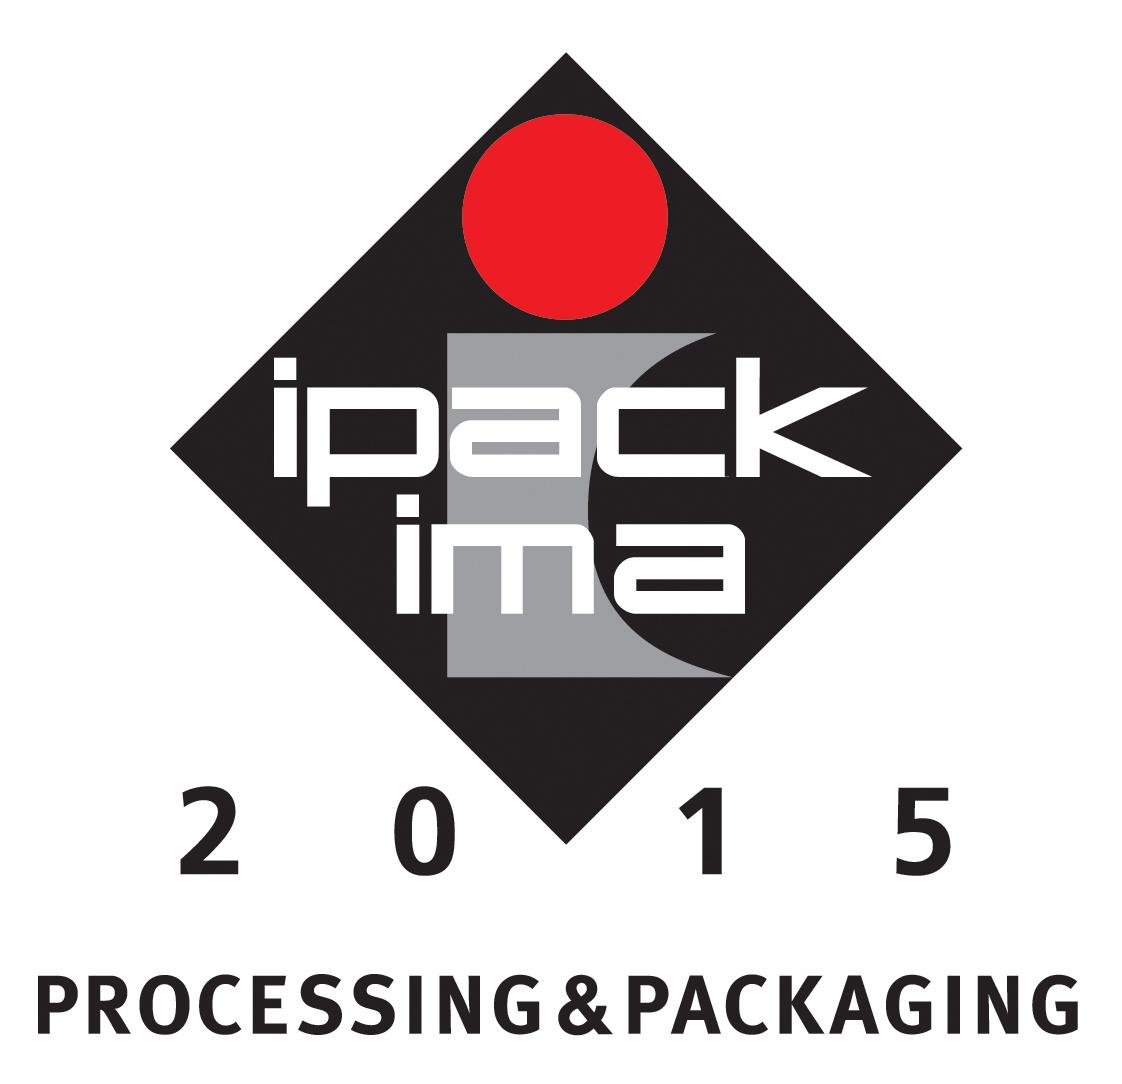 IPACK IMA 2015